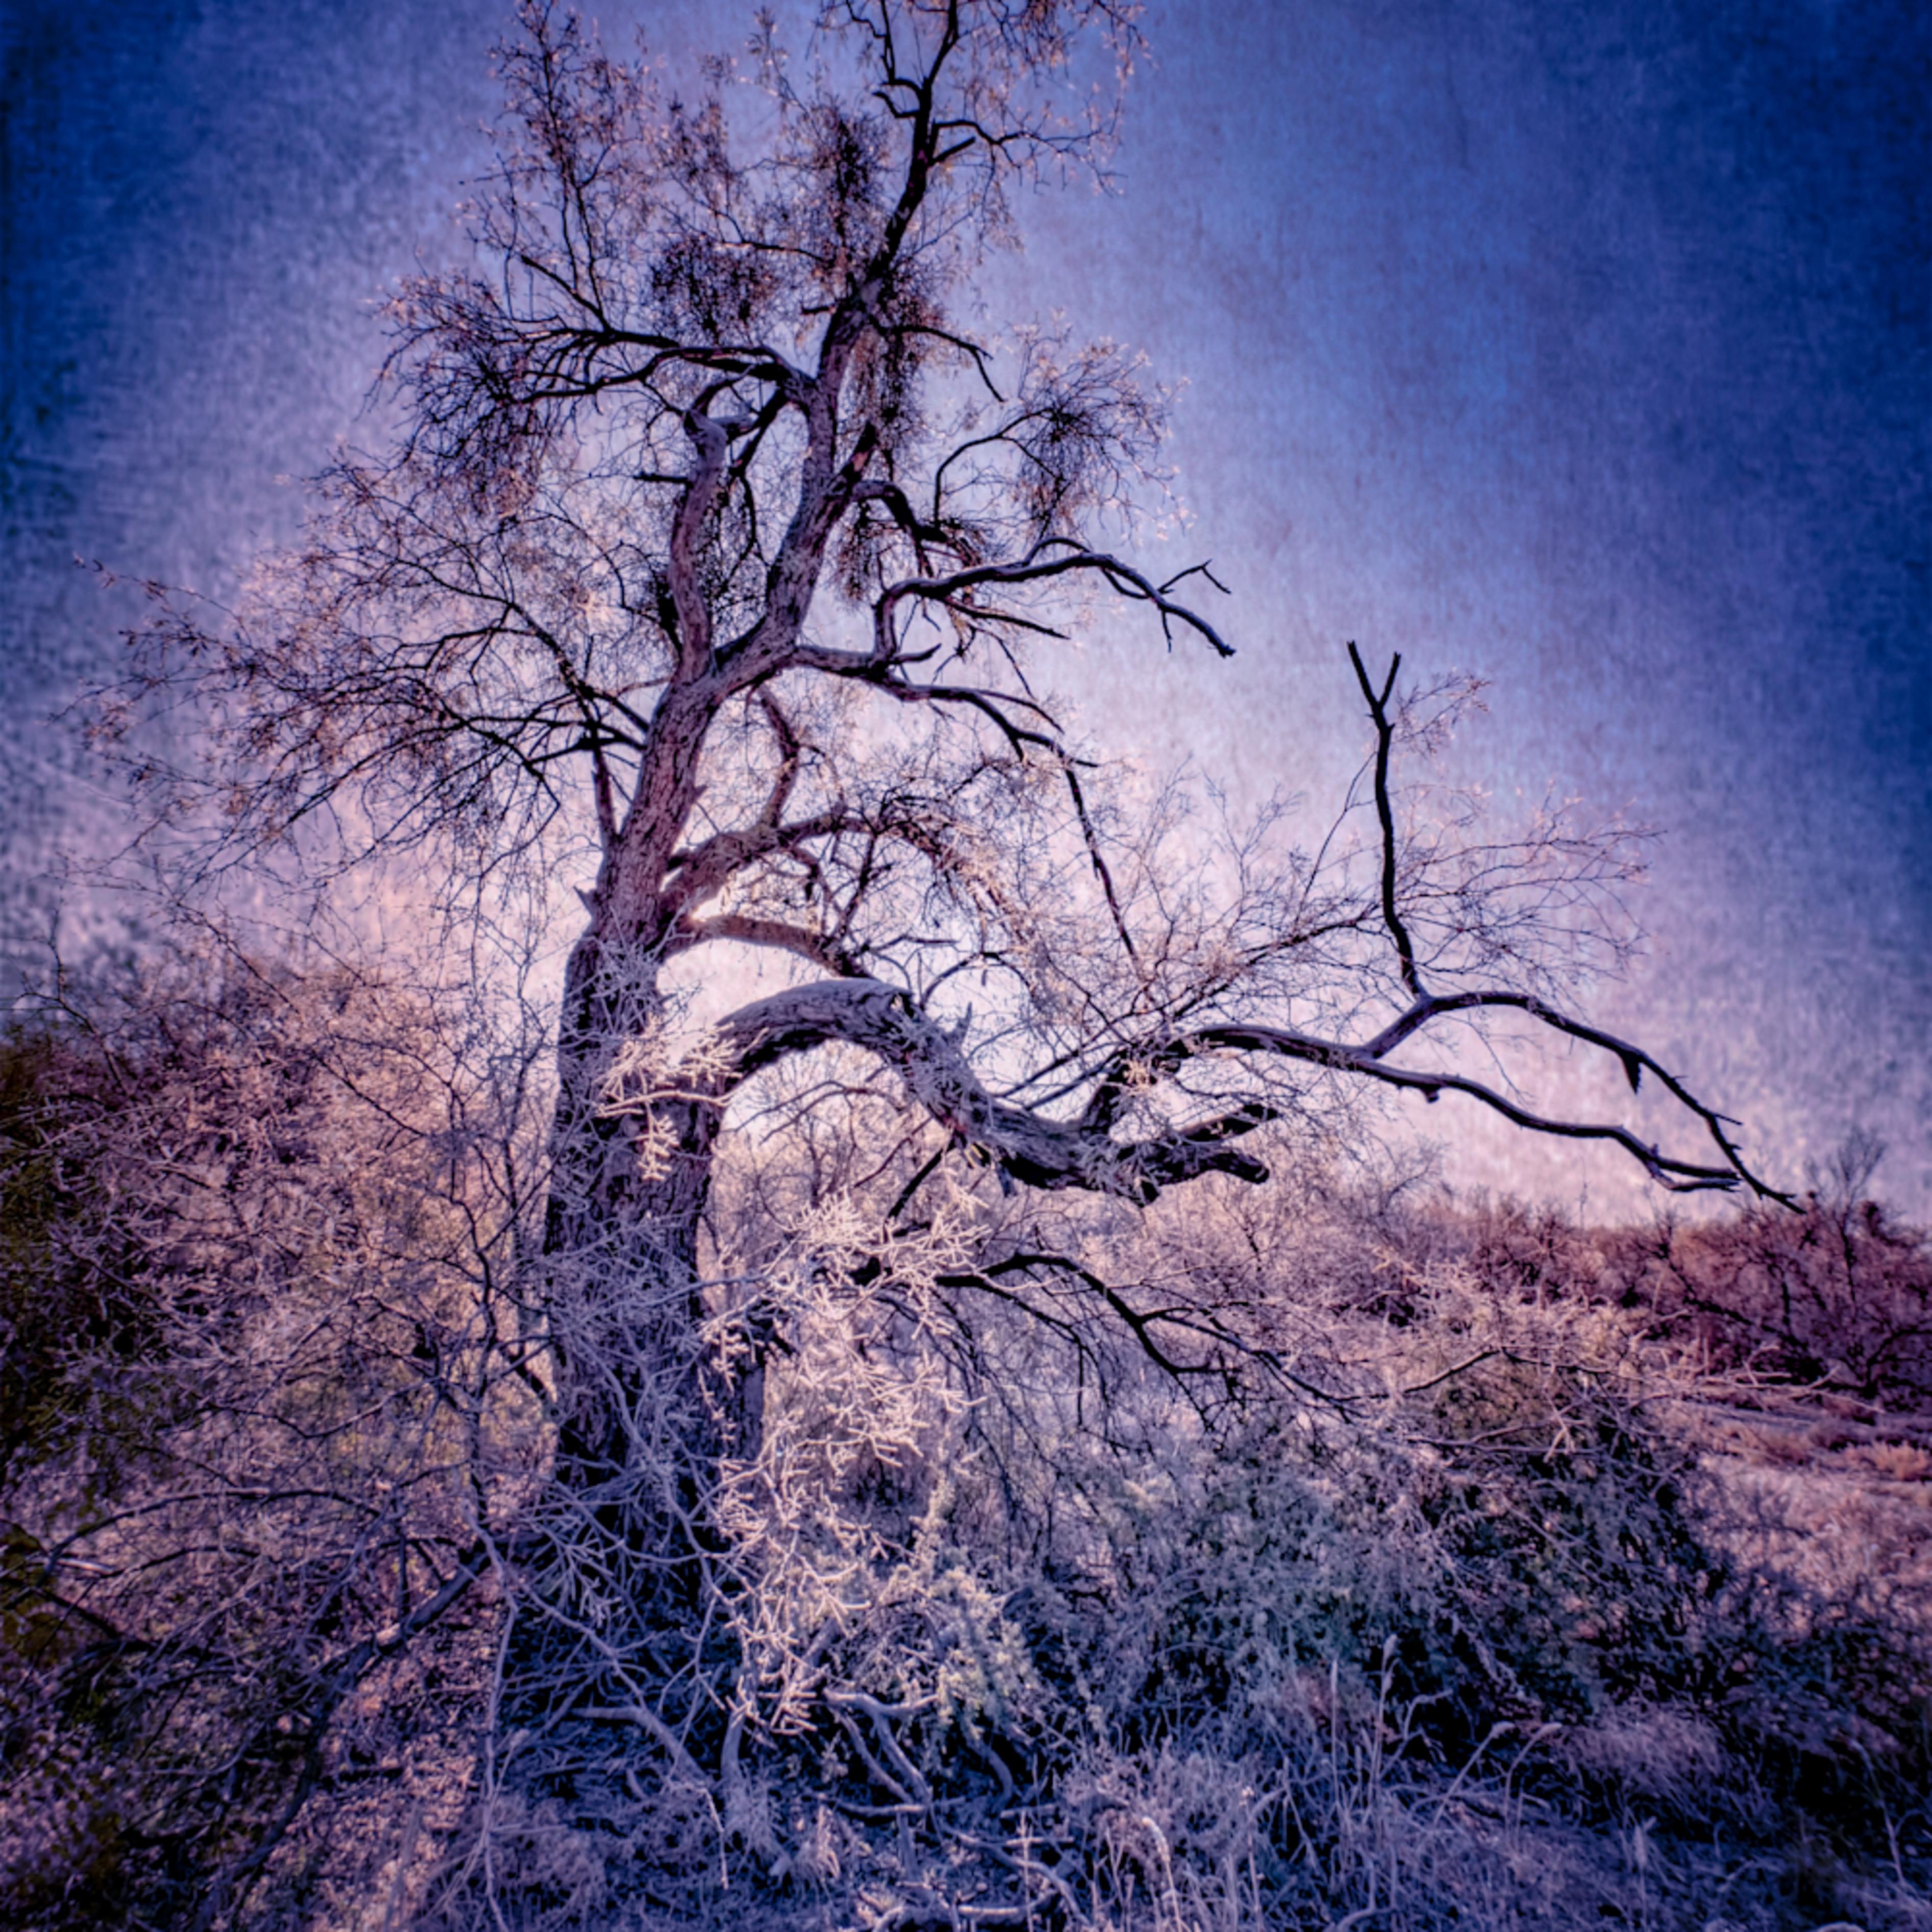 Old man winter blues rrwstp